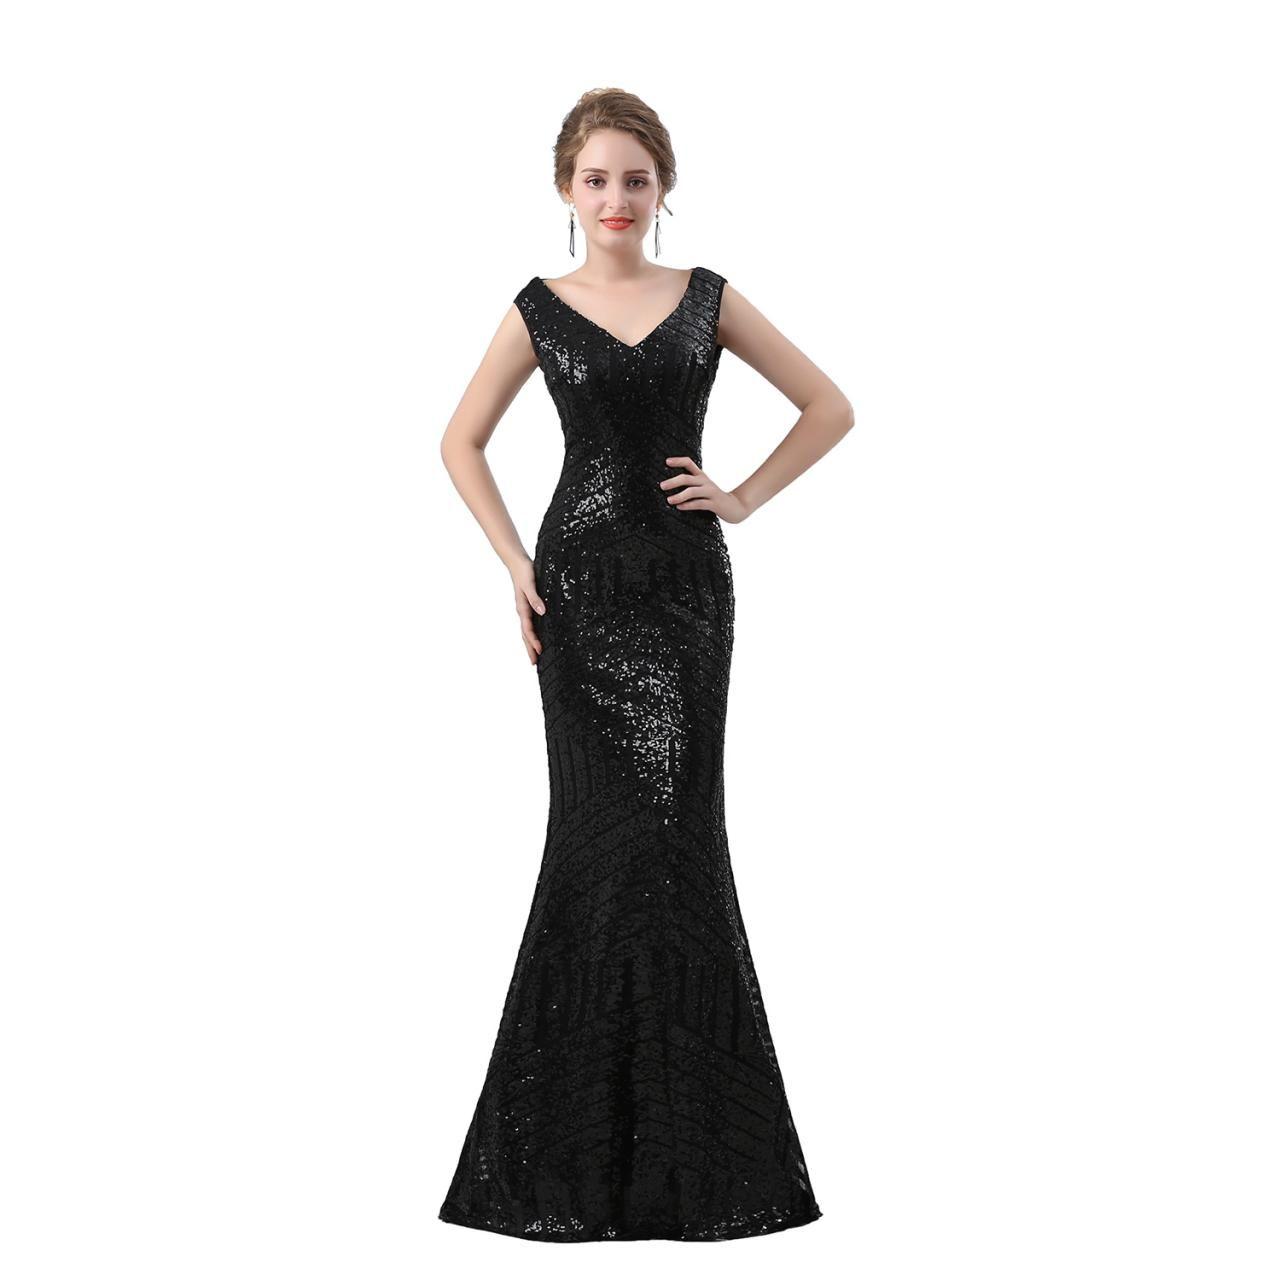 Black prom dressmermaid prom dresseslong elegant prom dresssexy